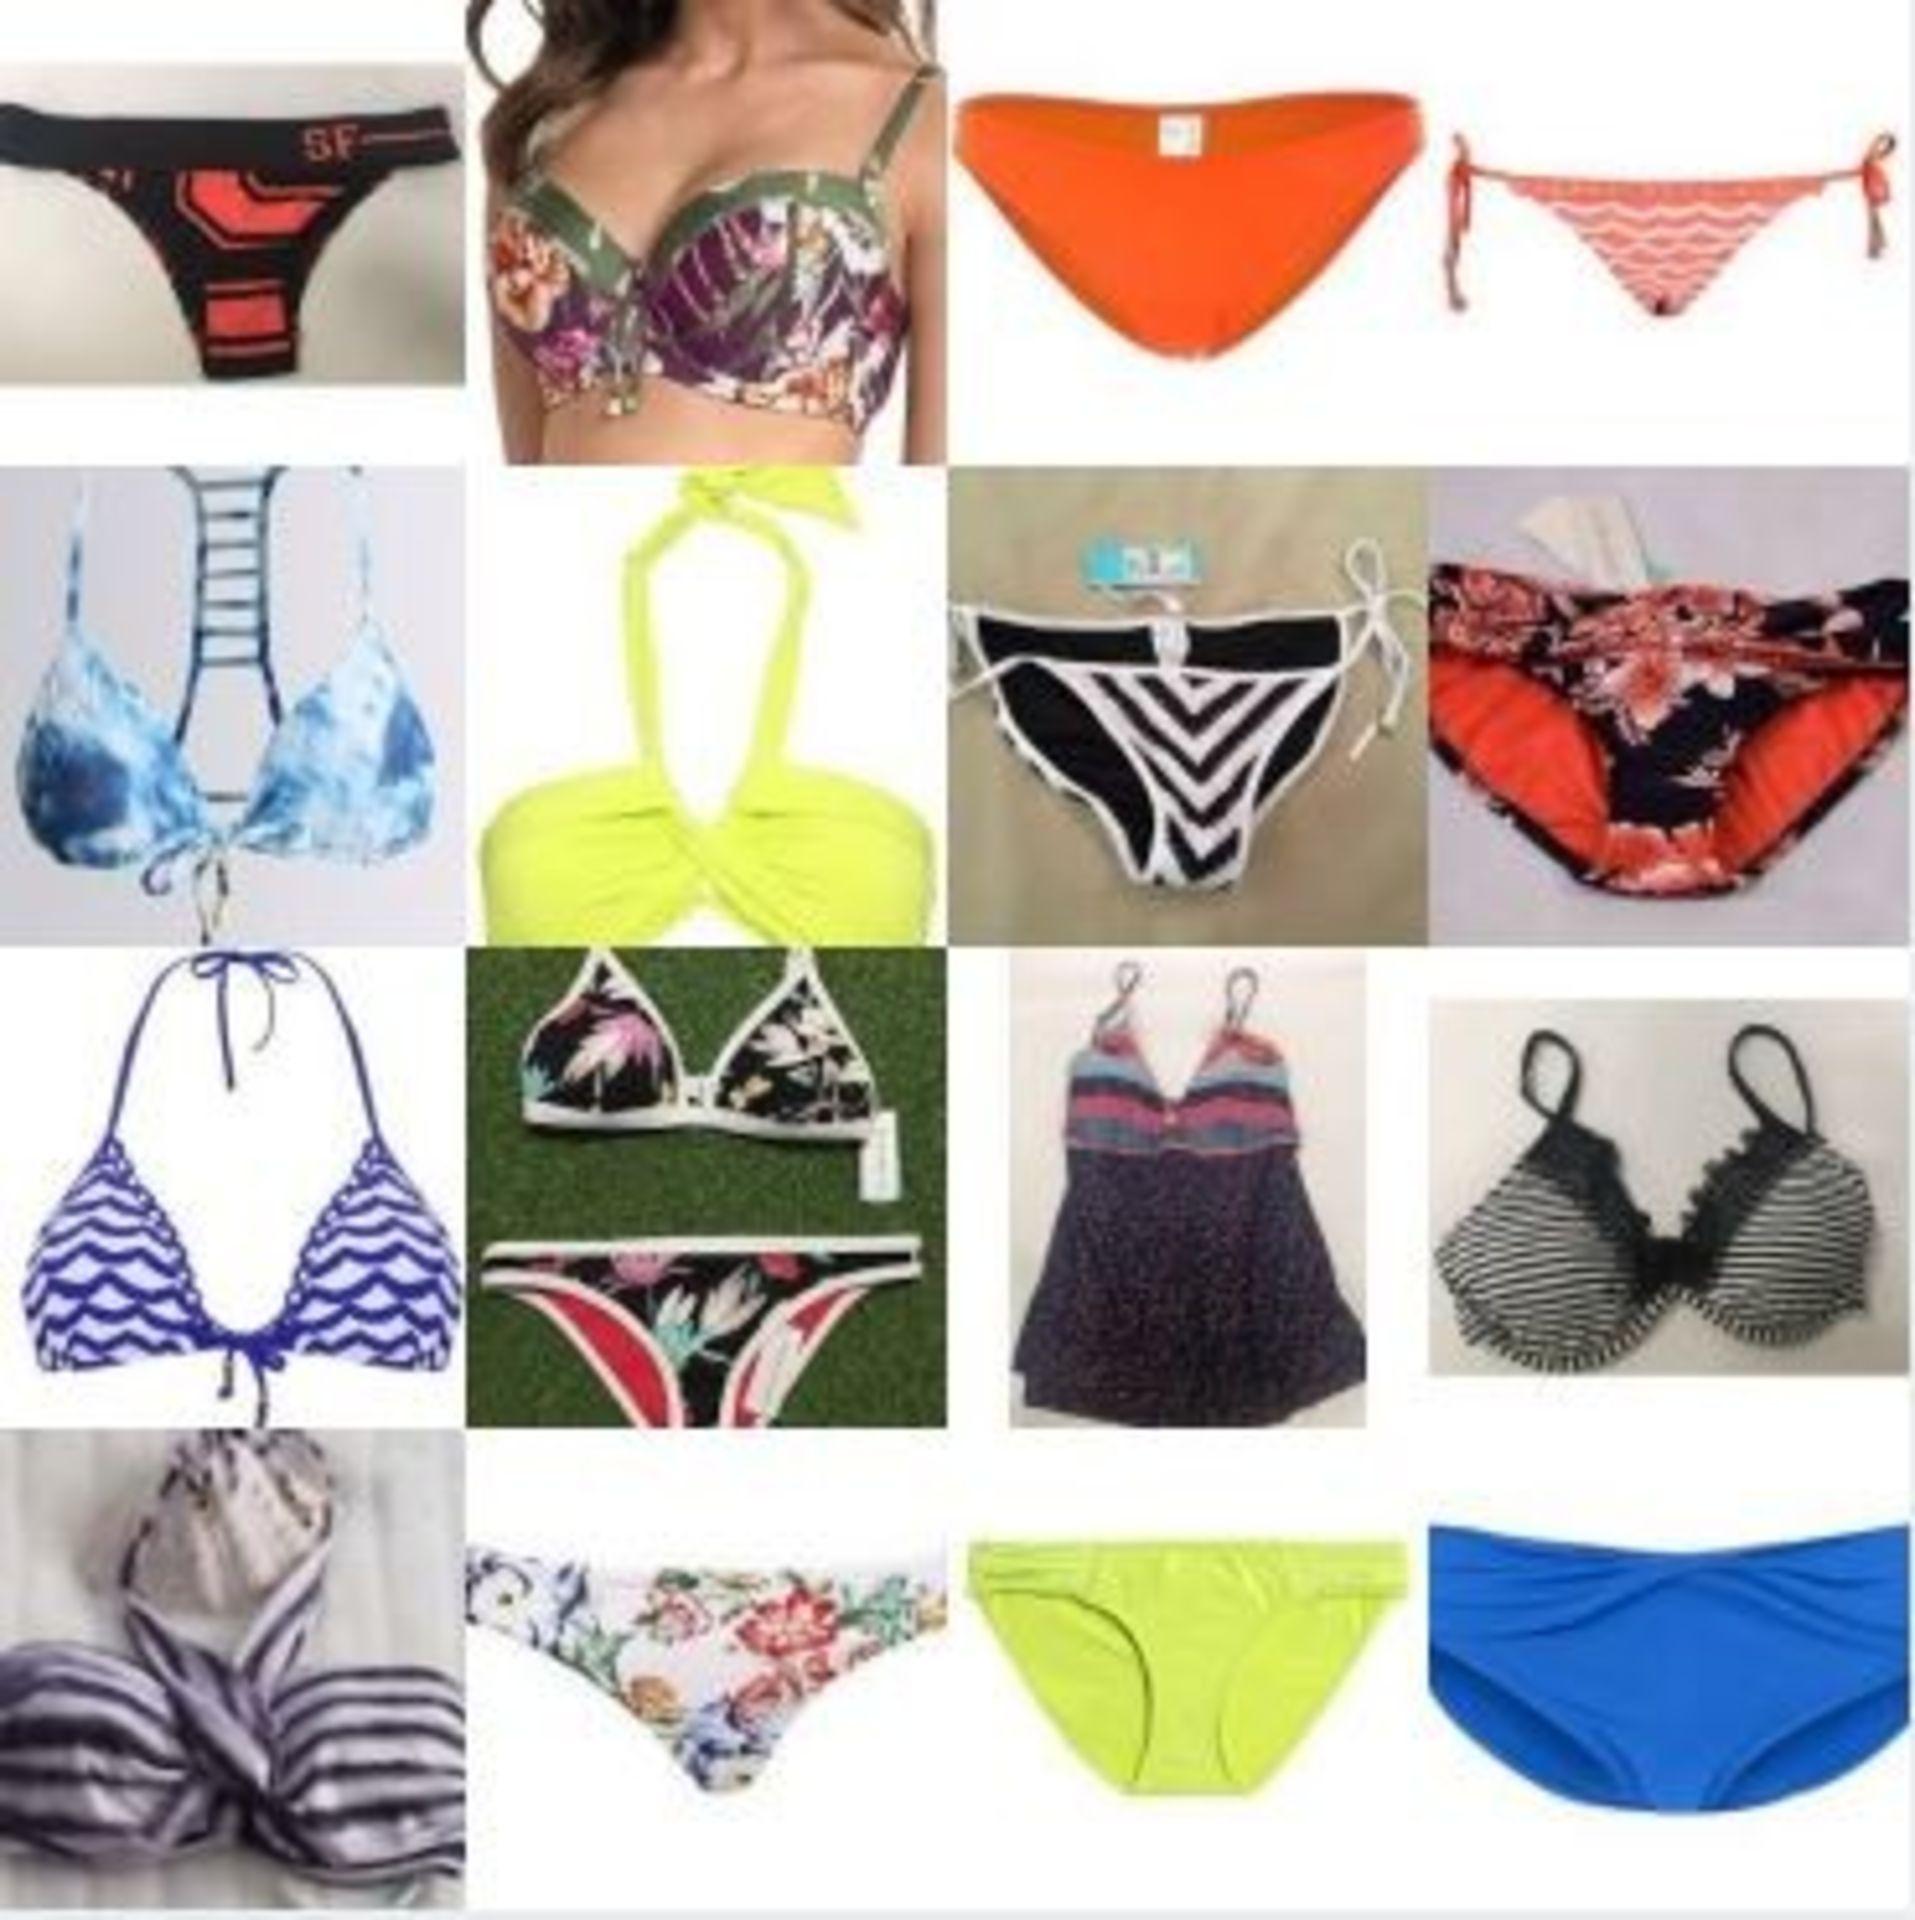 Lot 24 - Sourced From Big Brand Bikini Manufacturer SeaFolly: